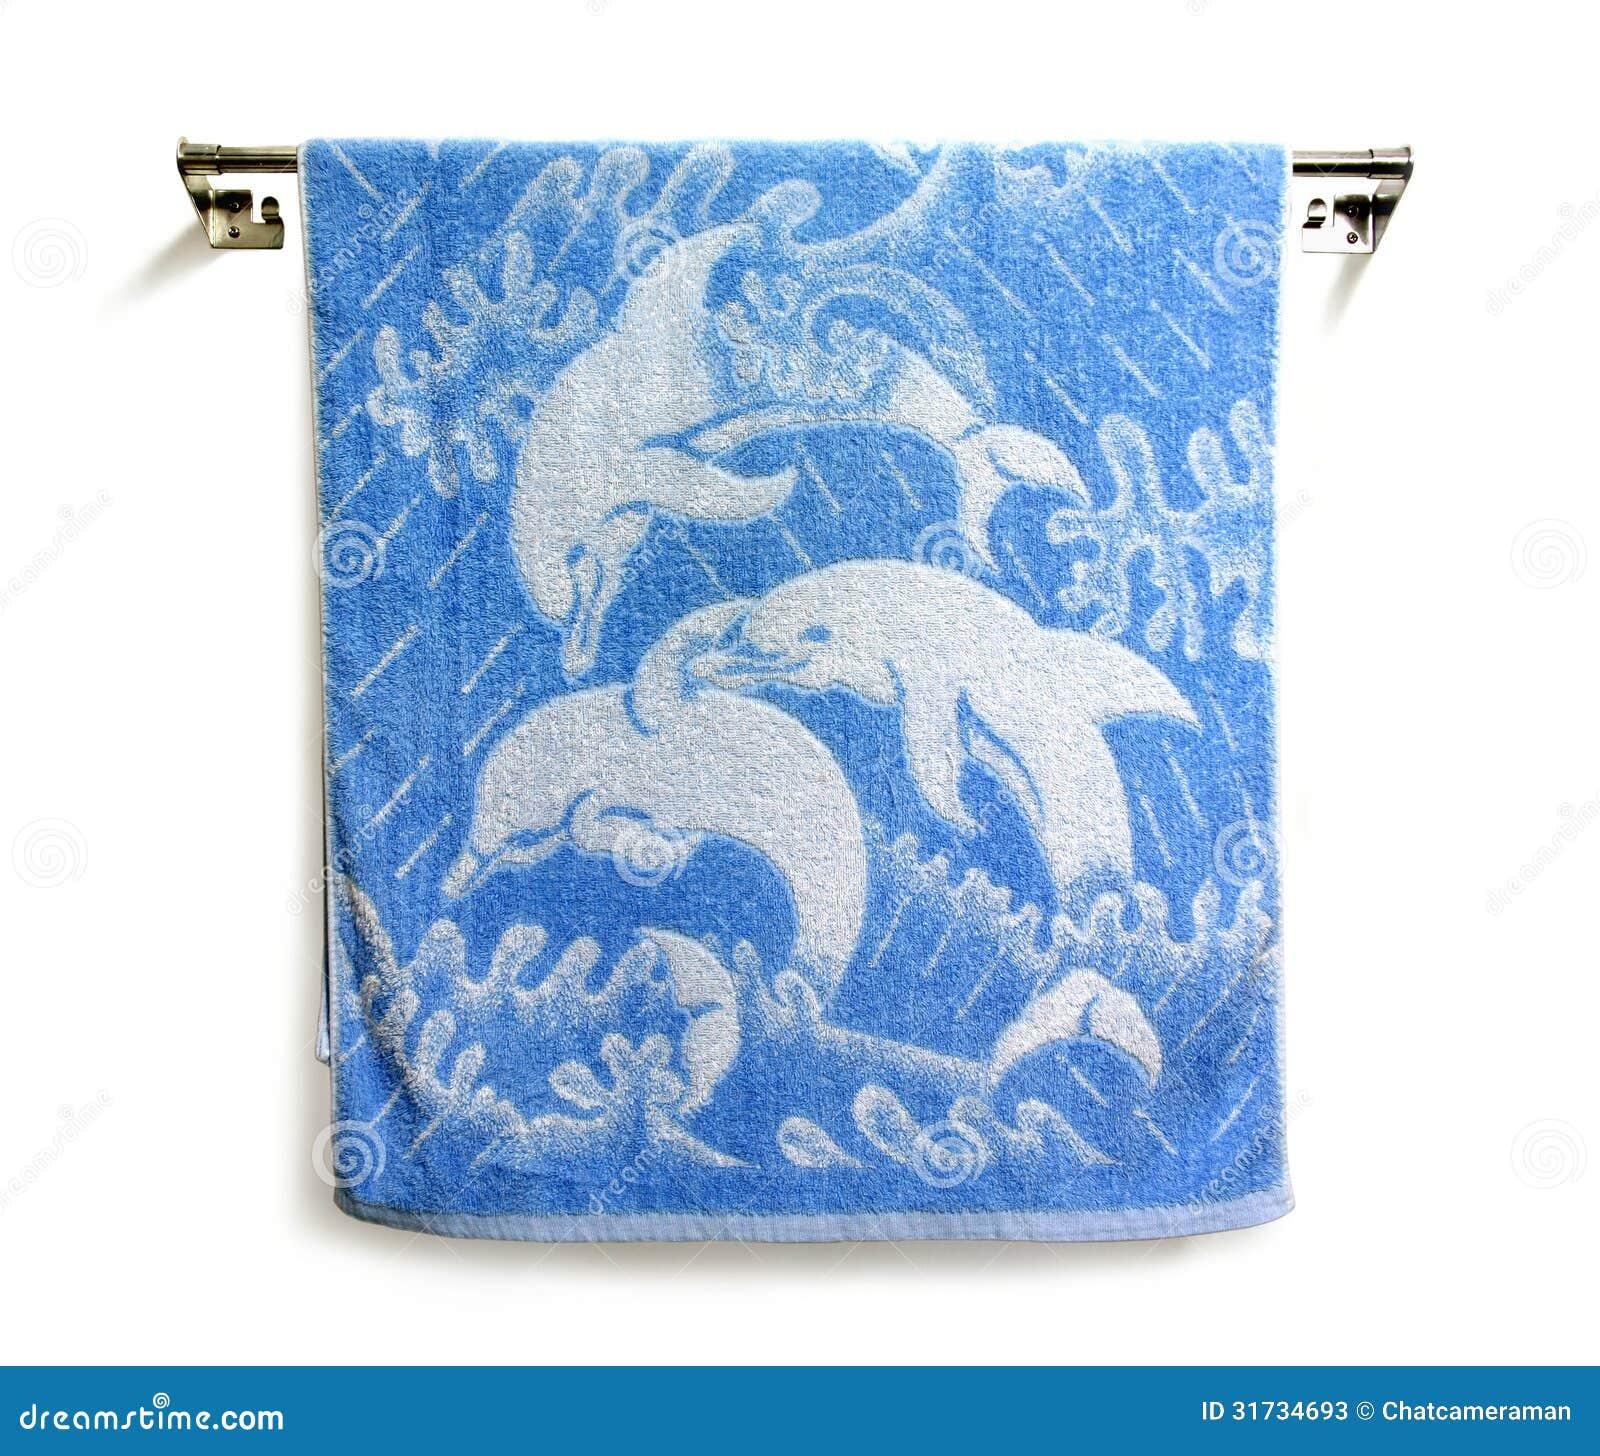 Hanging towels stock photos image 31734693